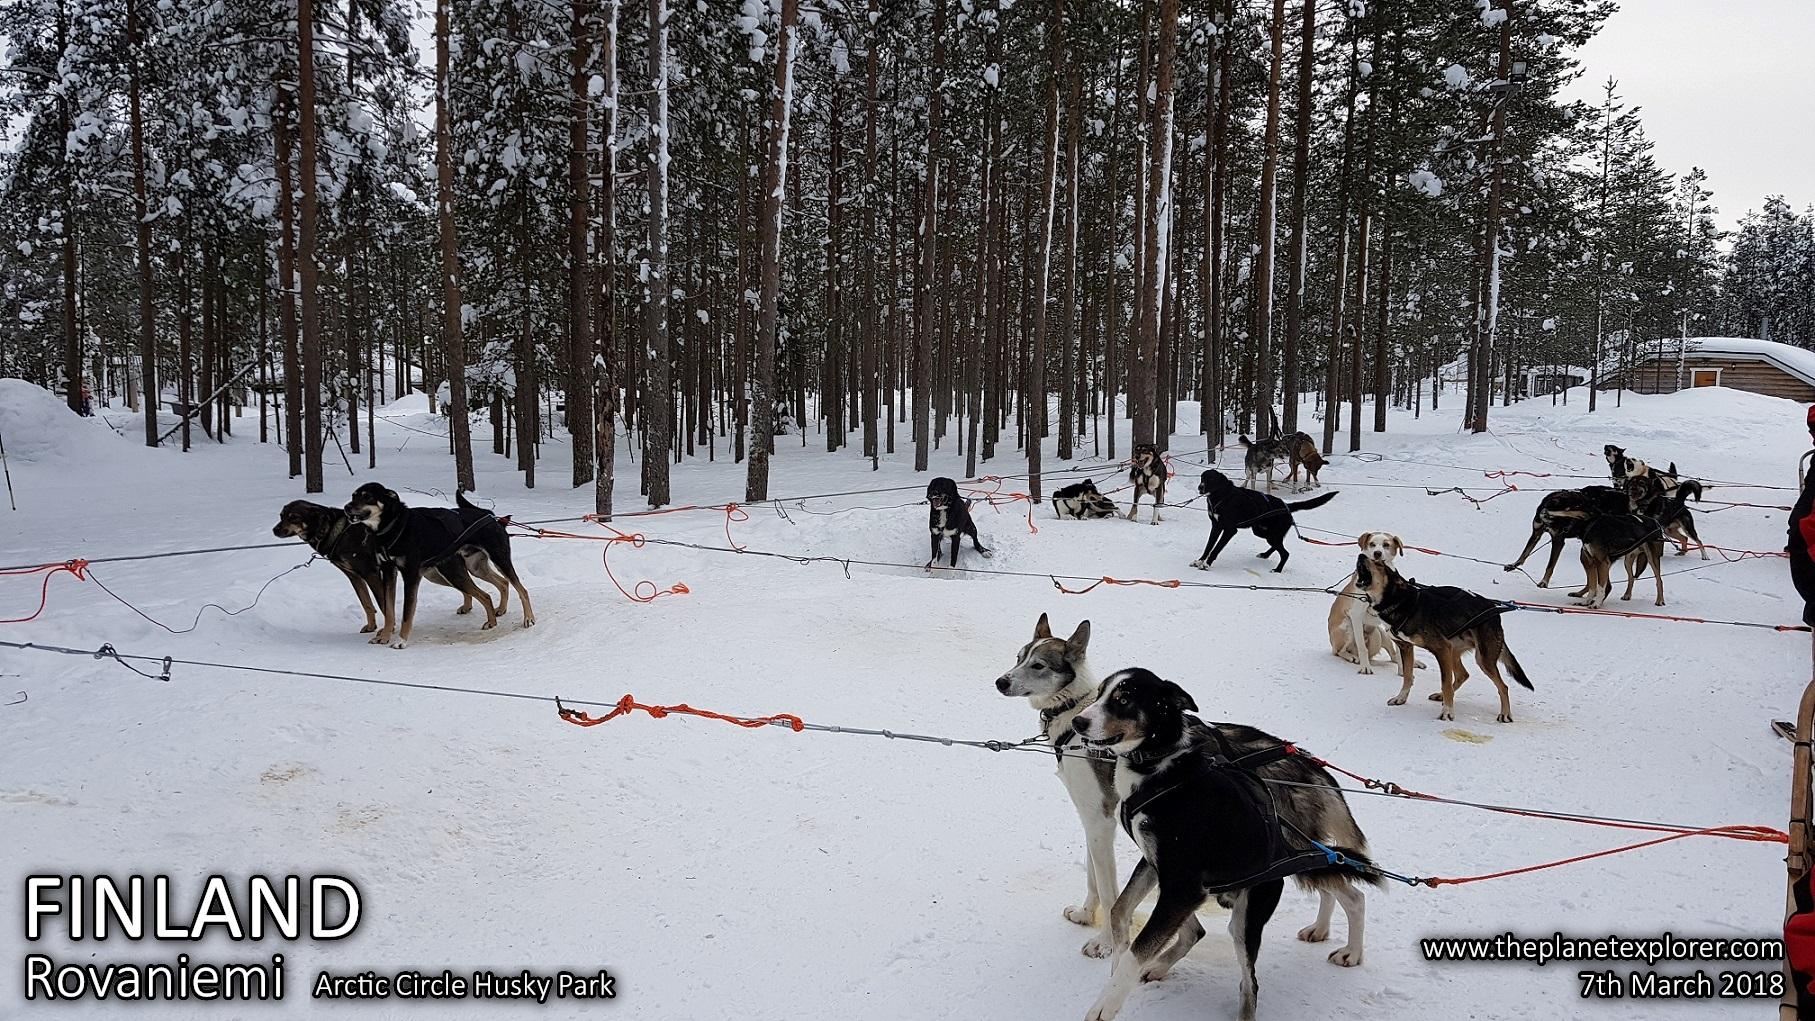 20180307_1311_Finland_Rovaniemi_Arctic Circle Husky Park_Samsung Note 8_LR_@www